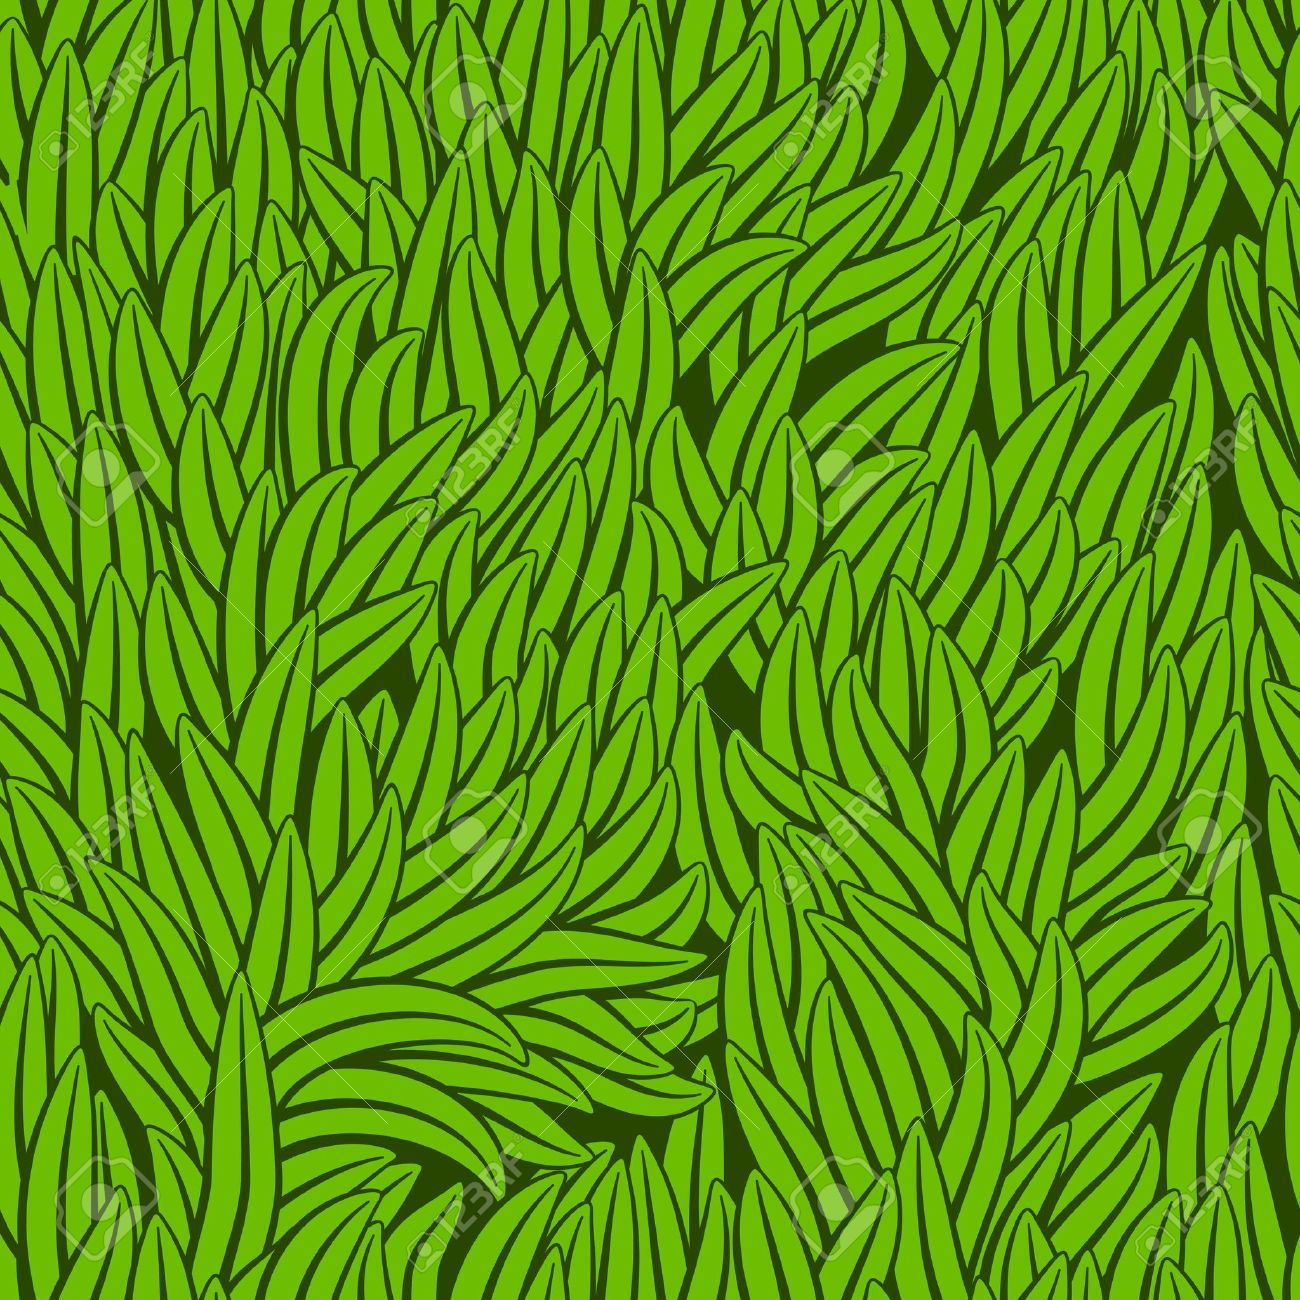 grass pattern illustrator.